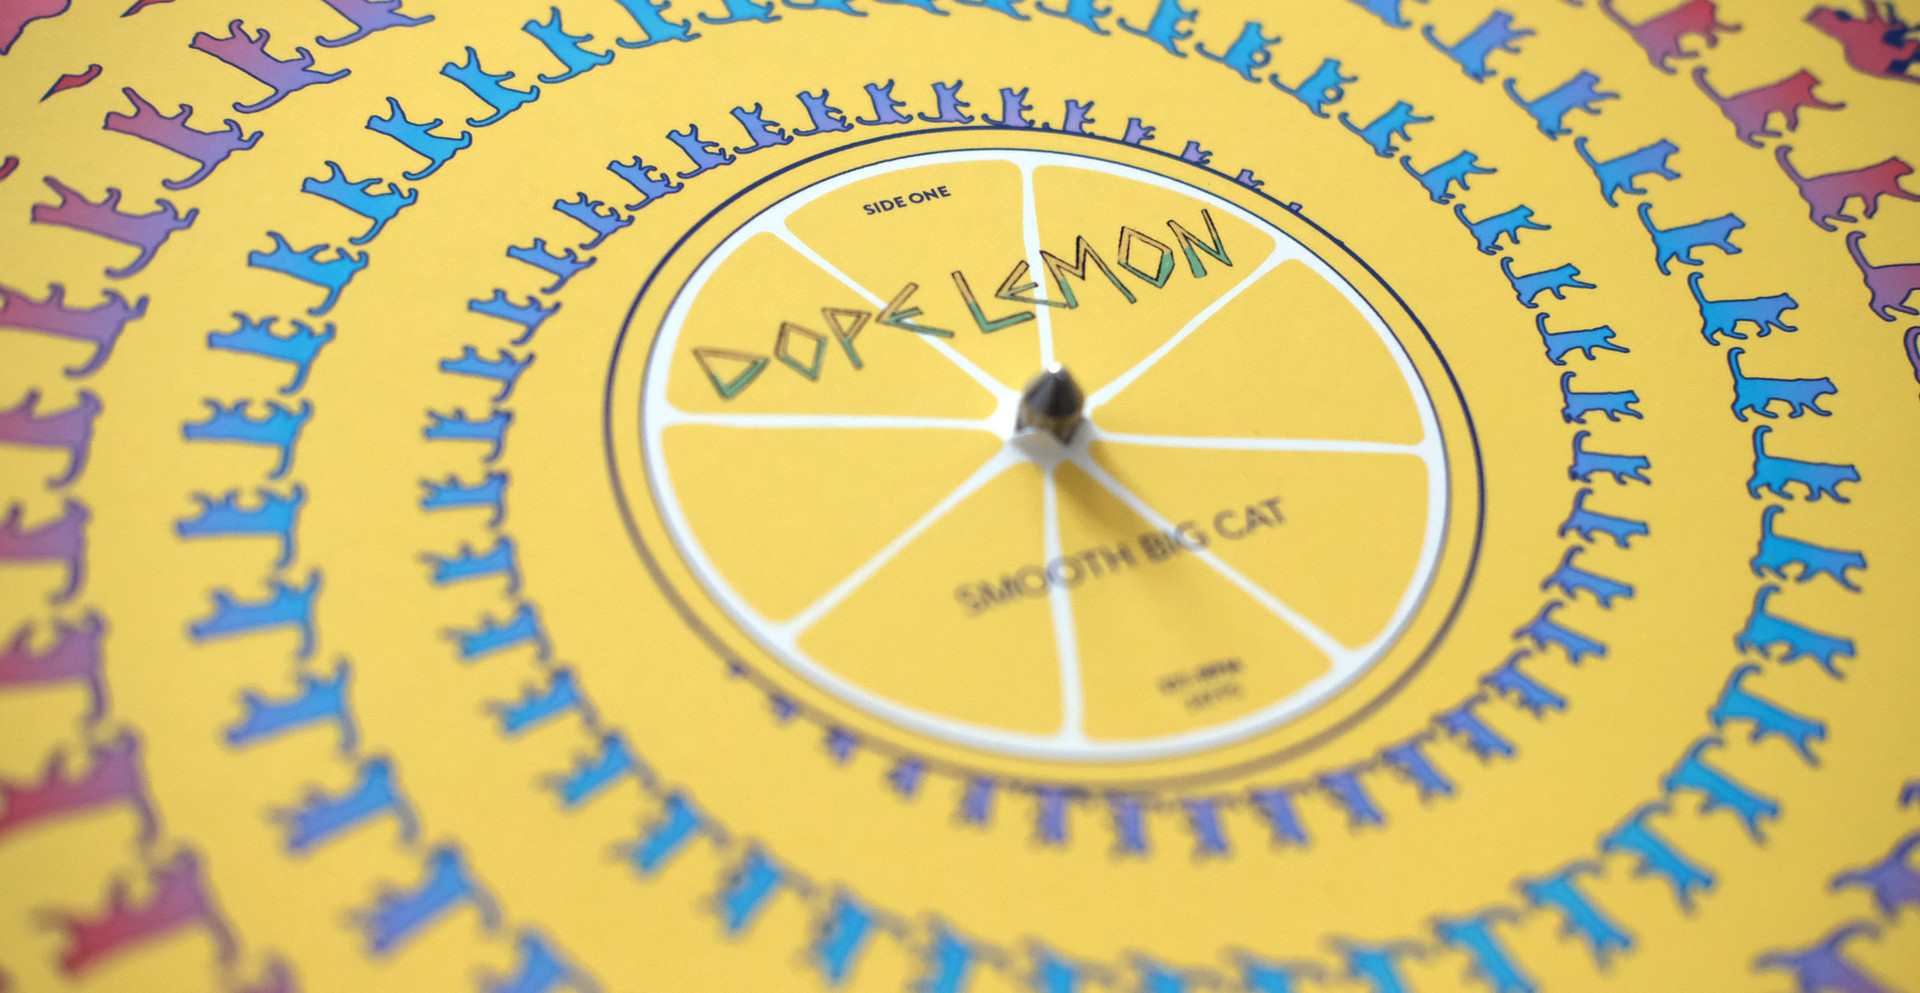 Dope Lemon 'Smooth Big Cat' – Animated vinyl